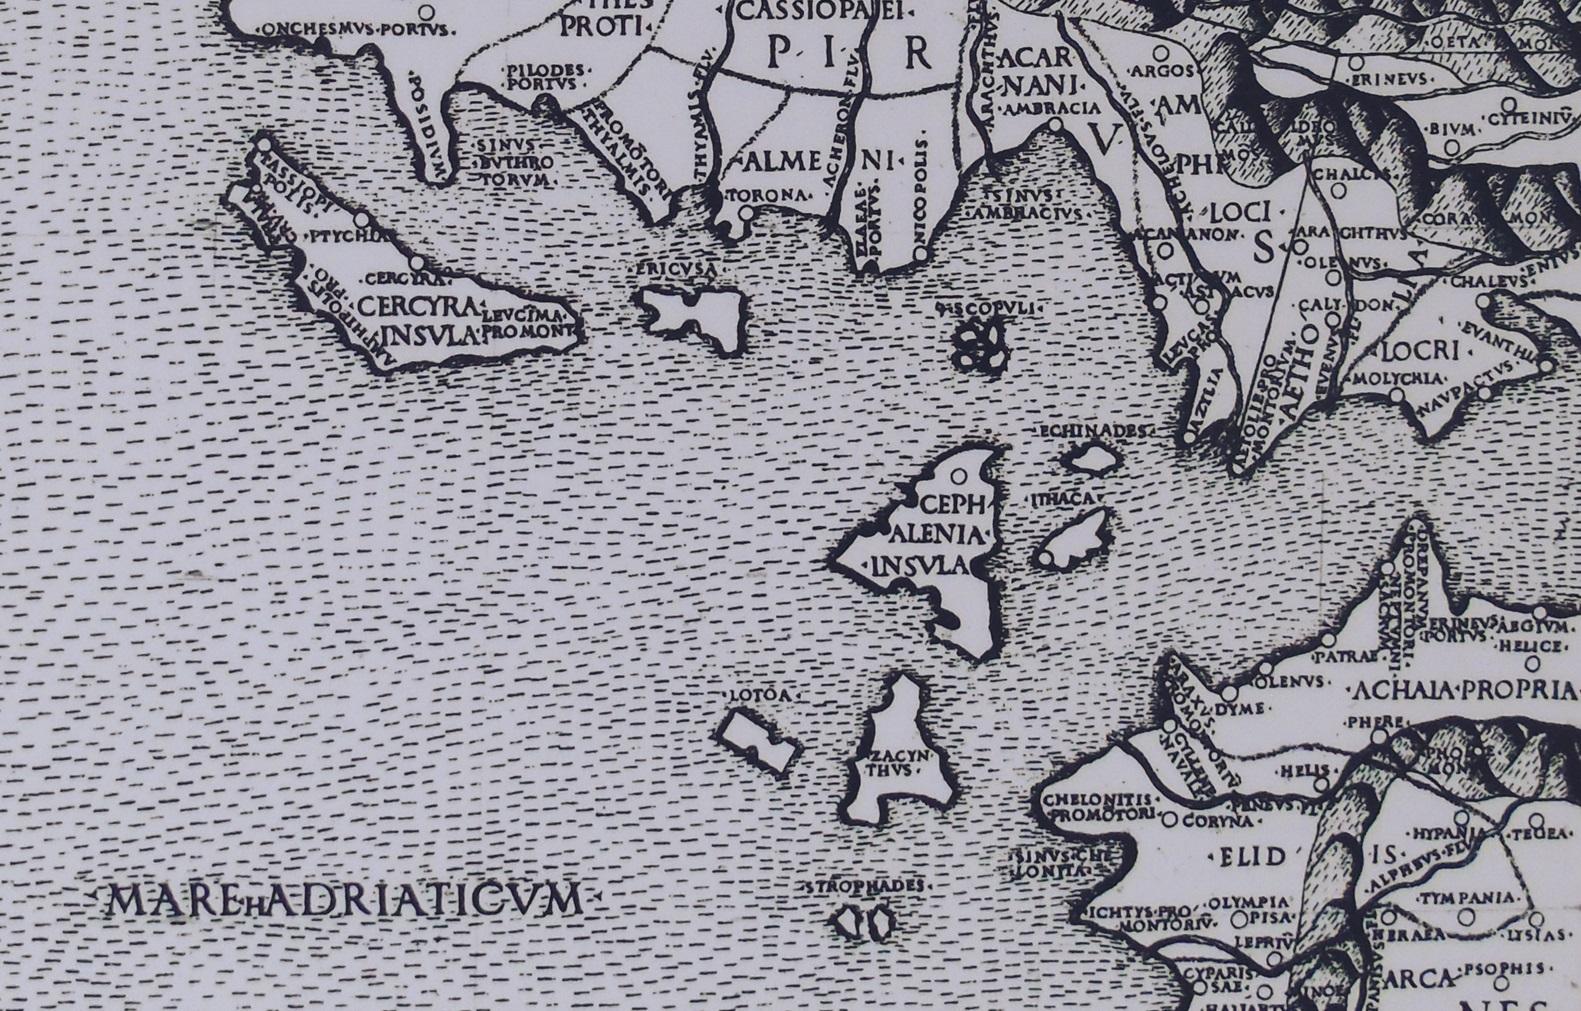 2_Tabula_X_Claudius Ptolemaus_Rom_1490